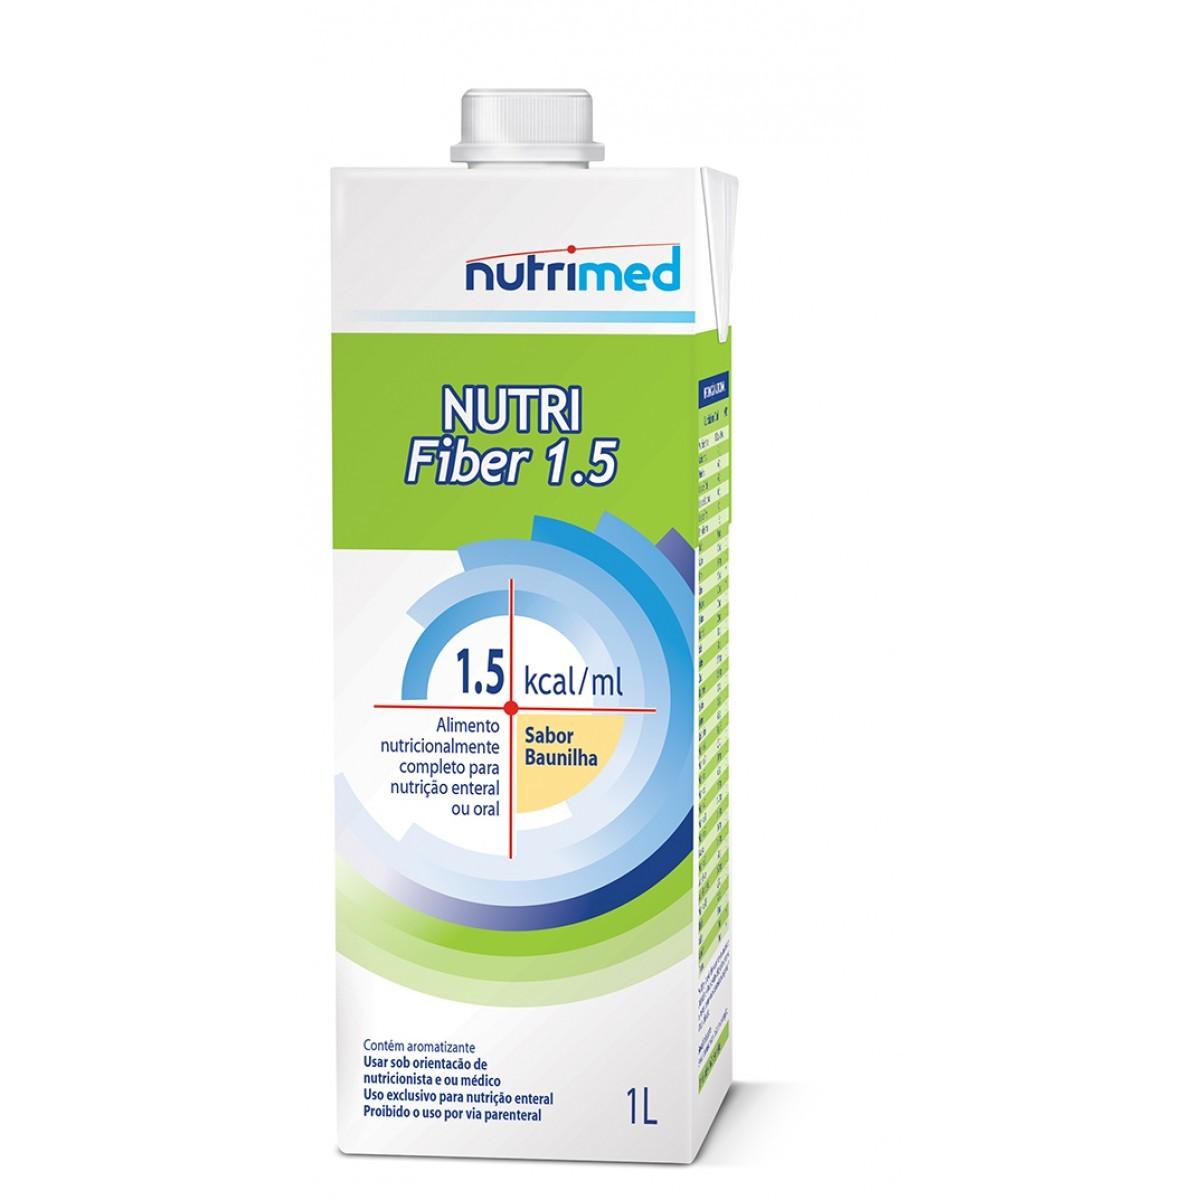 Nutri Fiber 1.5 (1.5 kcal/ml) Tetra Pak - 1 L - (DANONE)